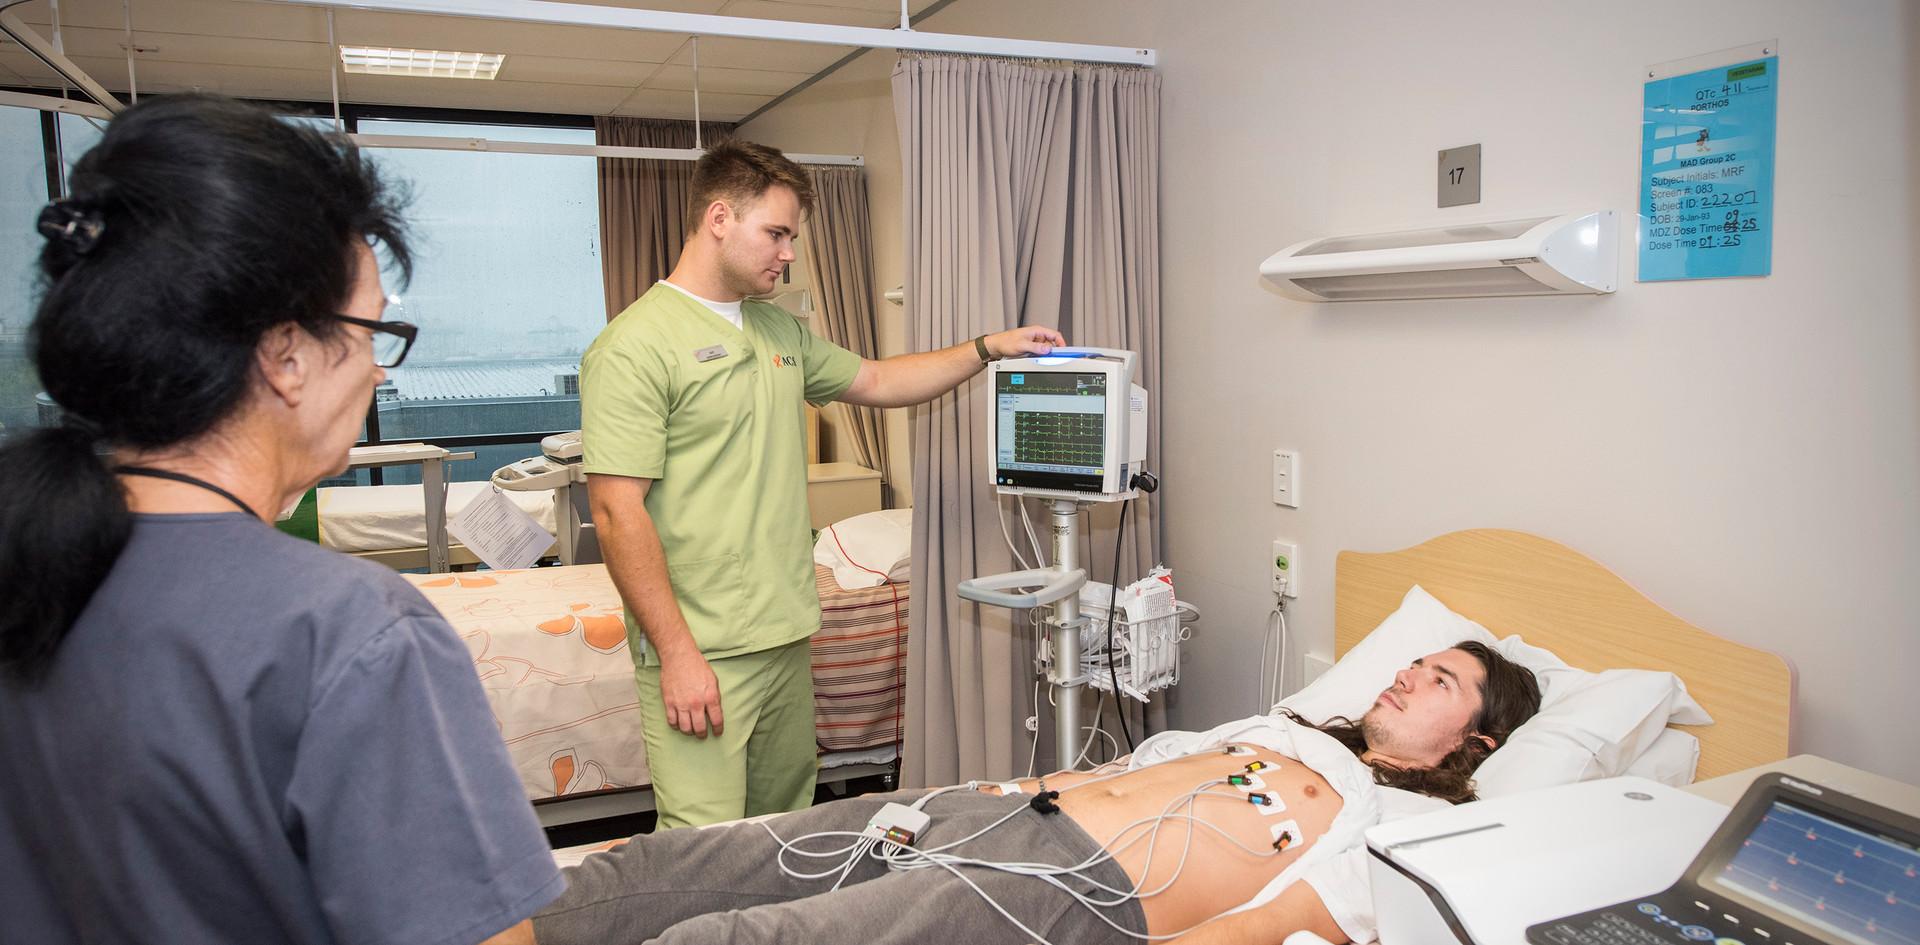 Auckland Clinical Studies Trials